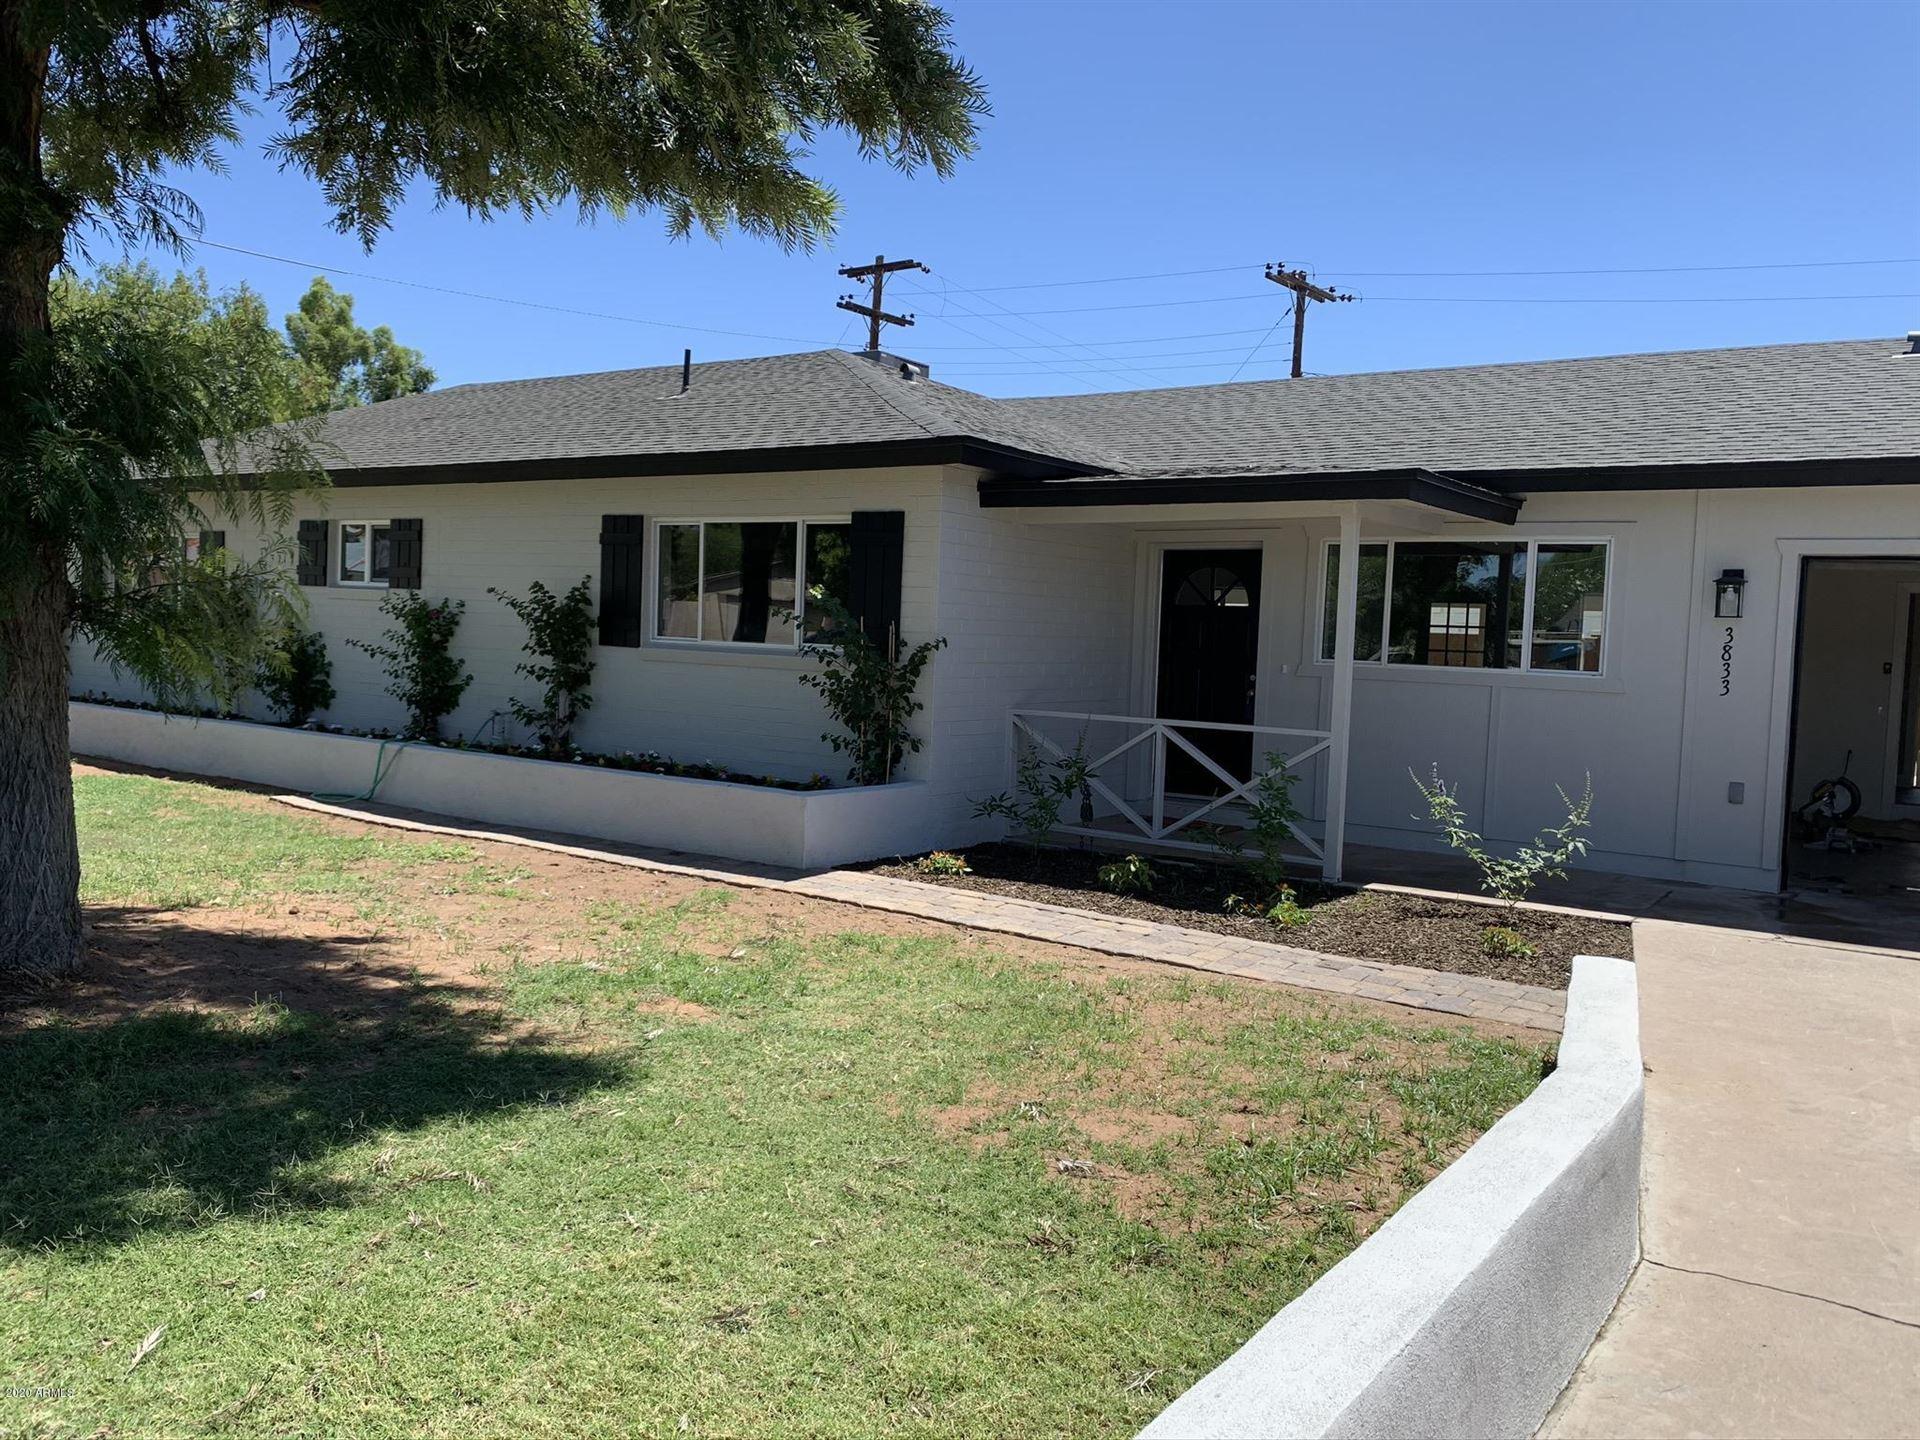 3833 N 35TH Street, Phoenix, AZ 85018 - MLS#: 6073251